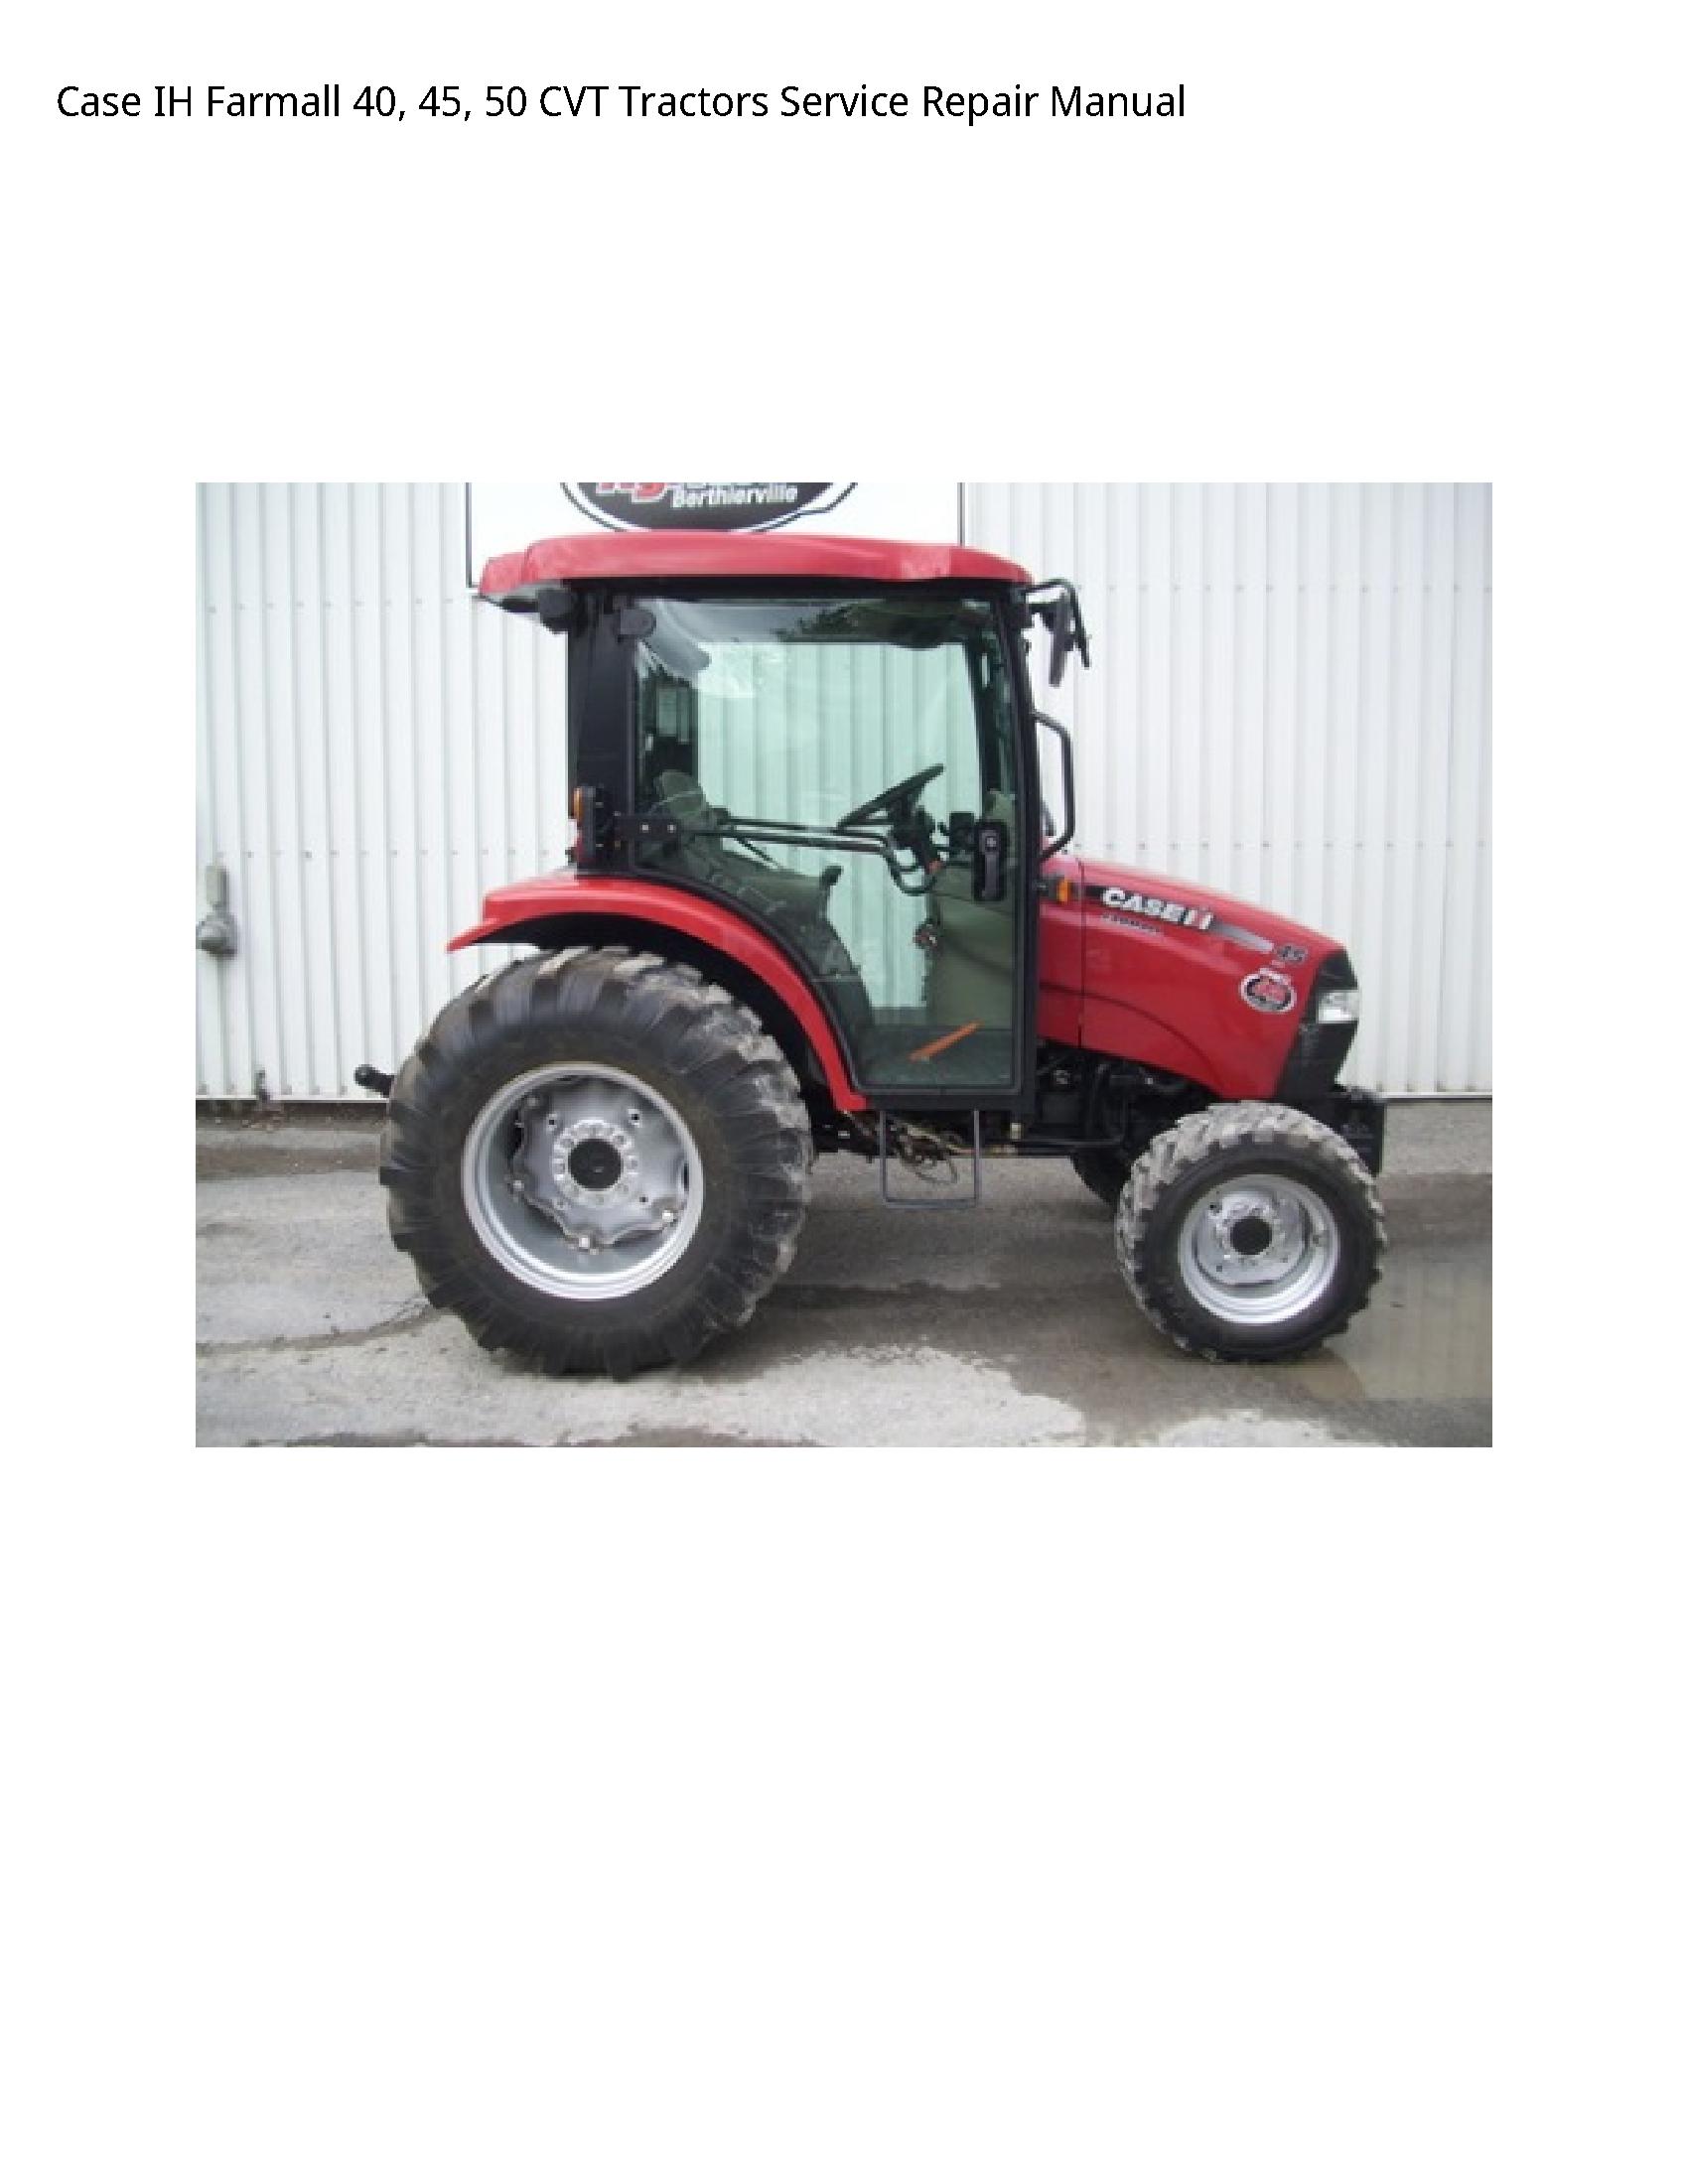 Case/Case IH 40 IH Farmall CVT Tractors manual